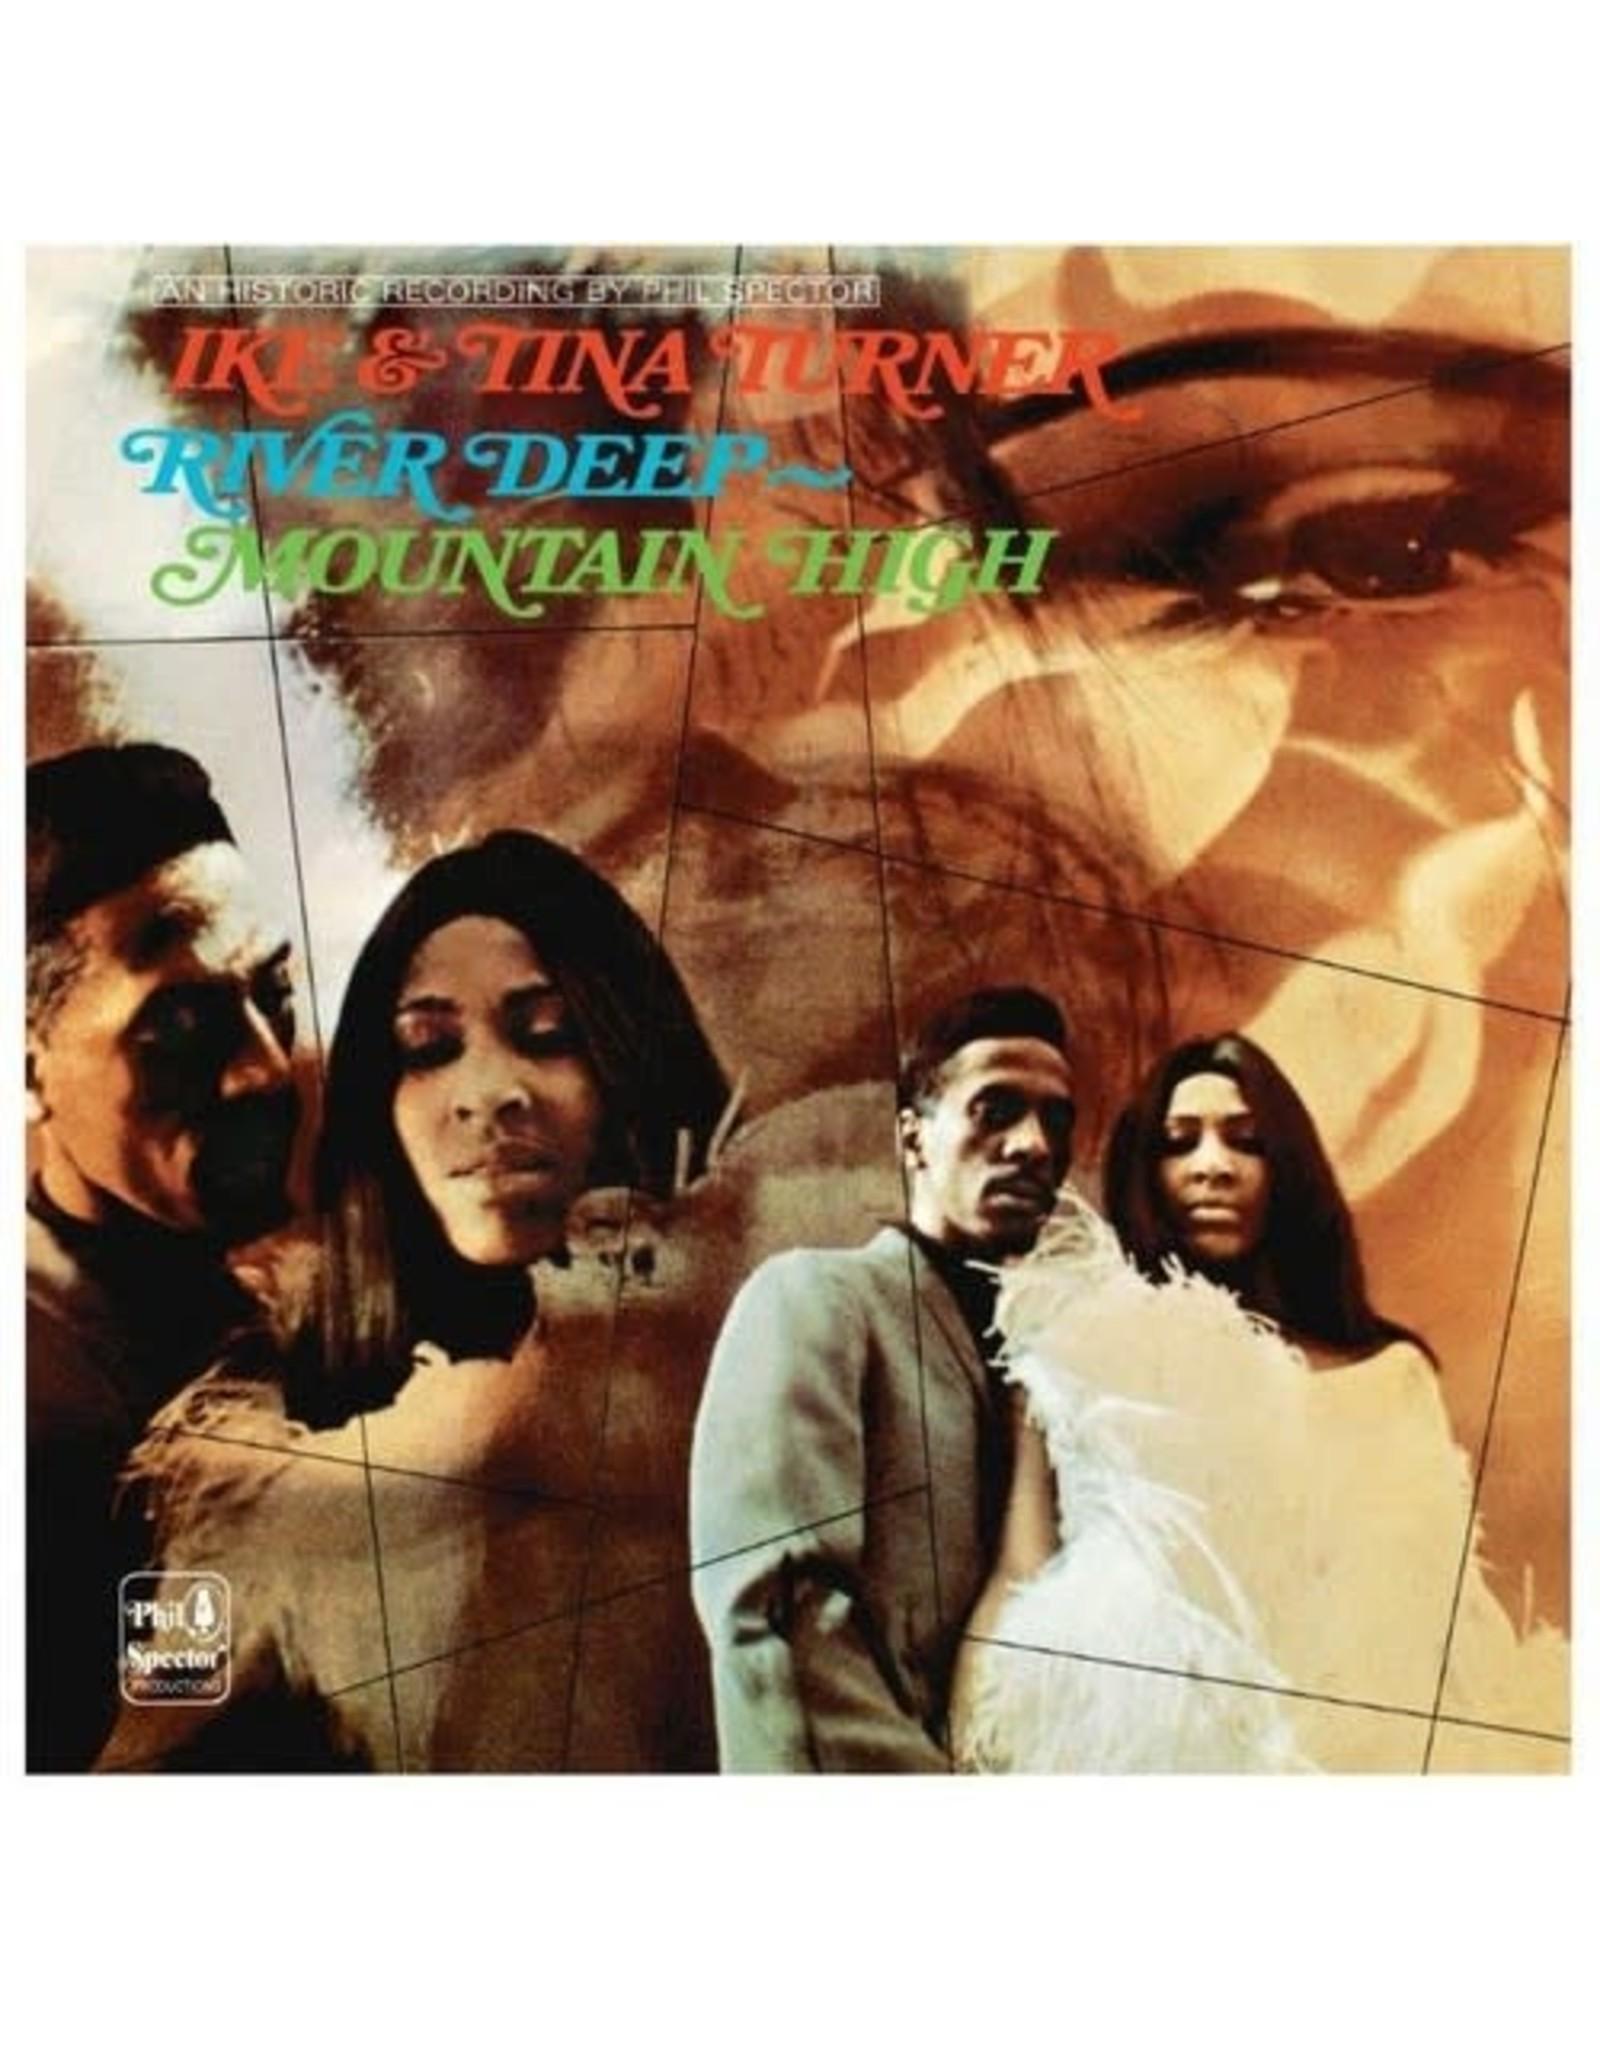 New Vinyl Ike & Tina Turner - River Deep Mountain High LP